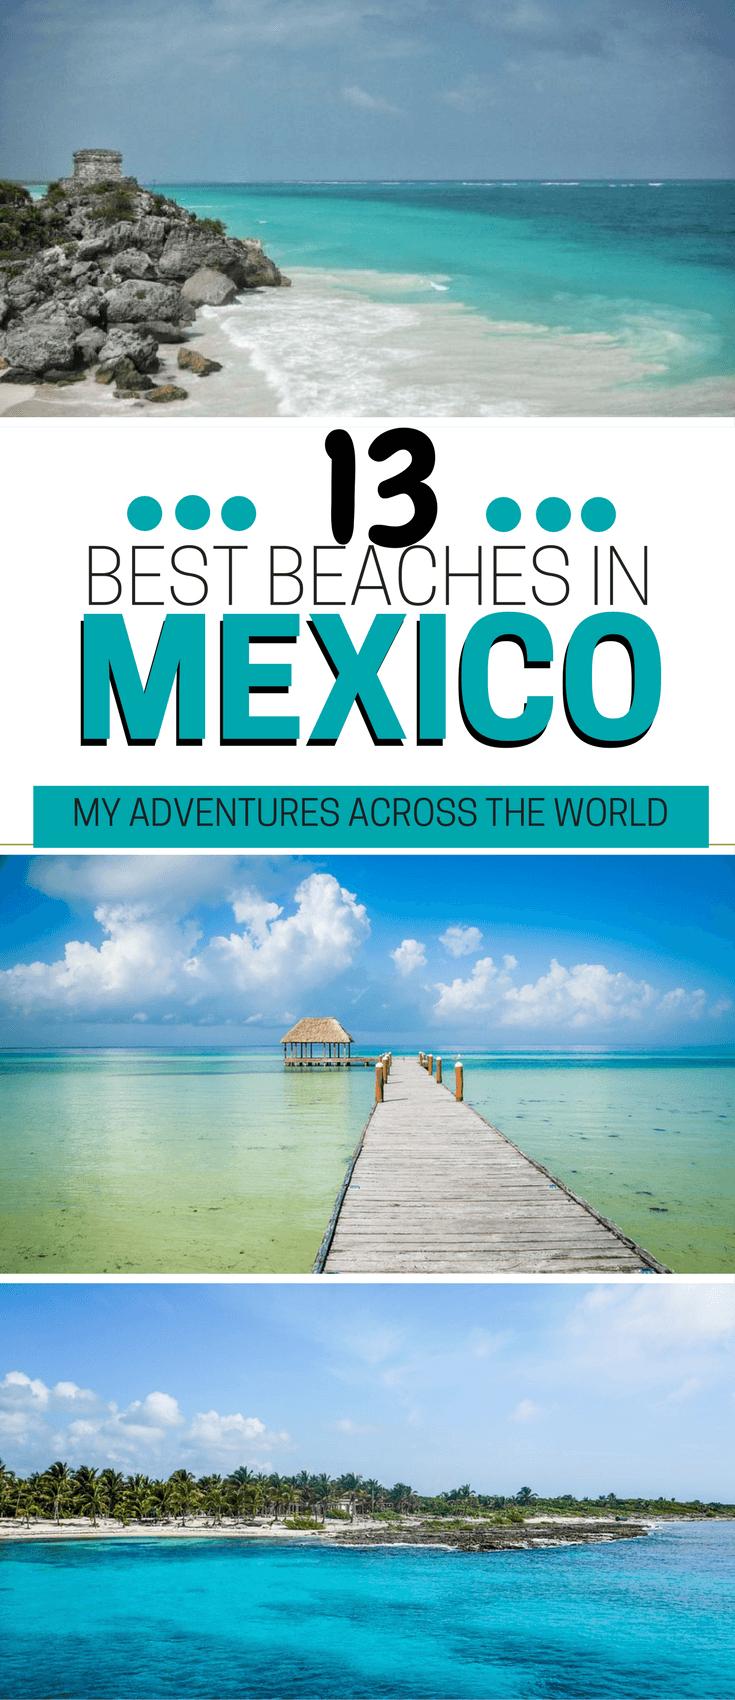 Enjoy the best beaches in Mexico - via @clautavani